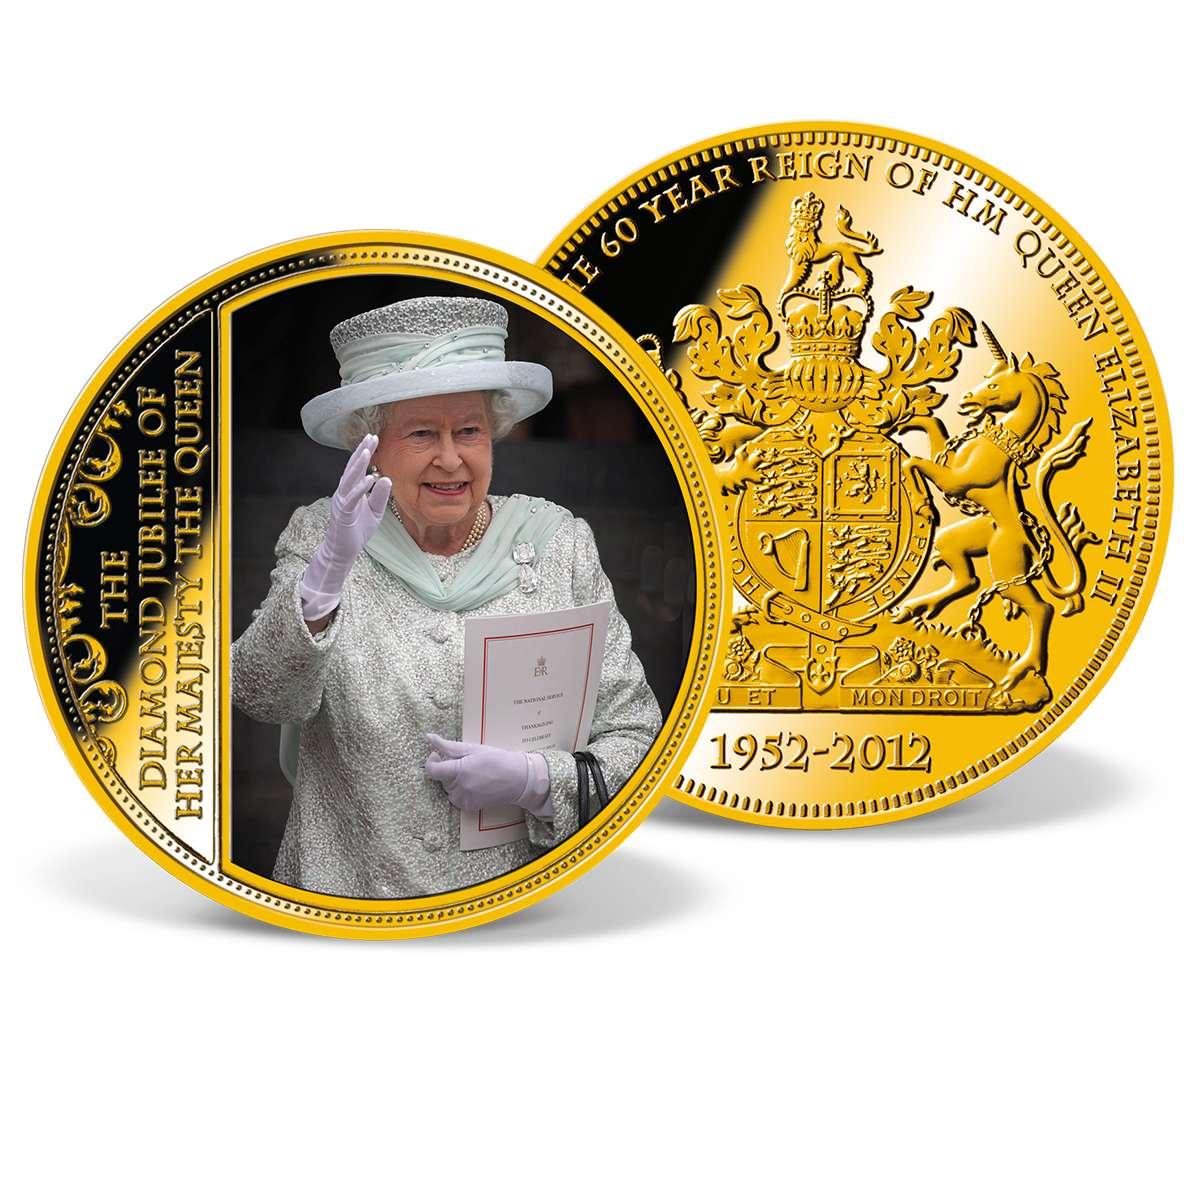 queen elizabeth diamond jubilee coin worth